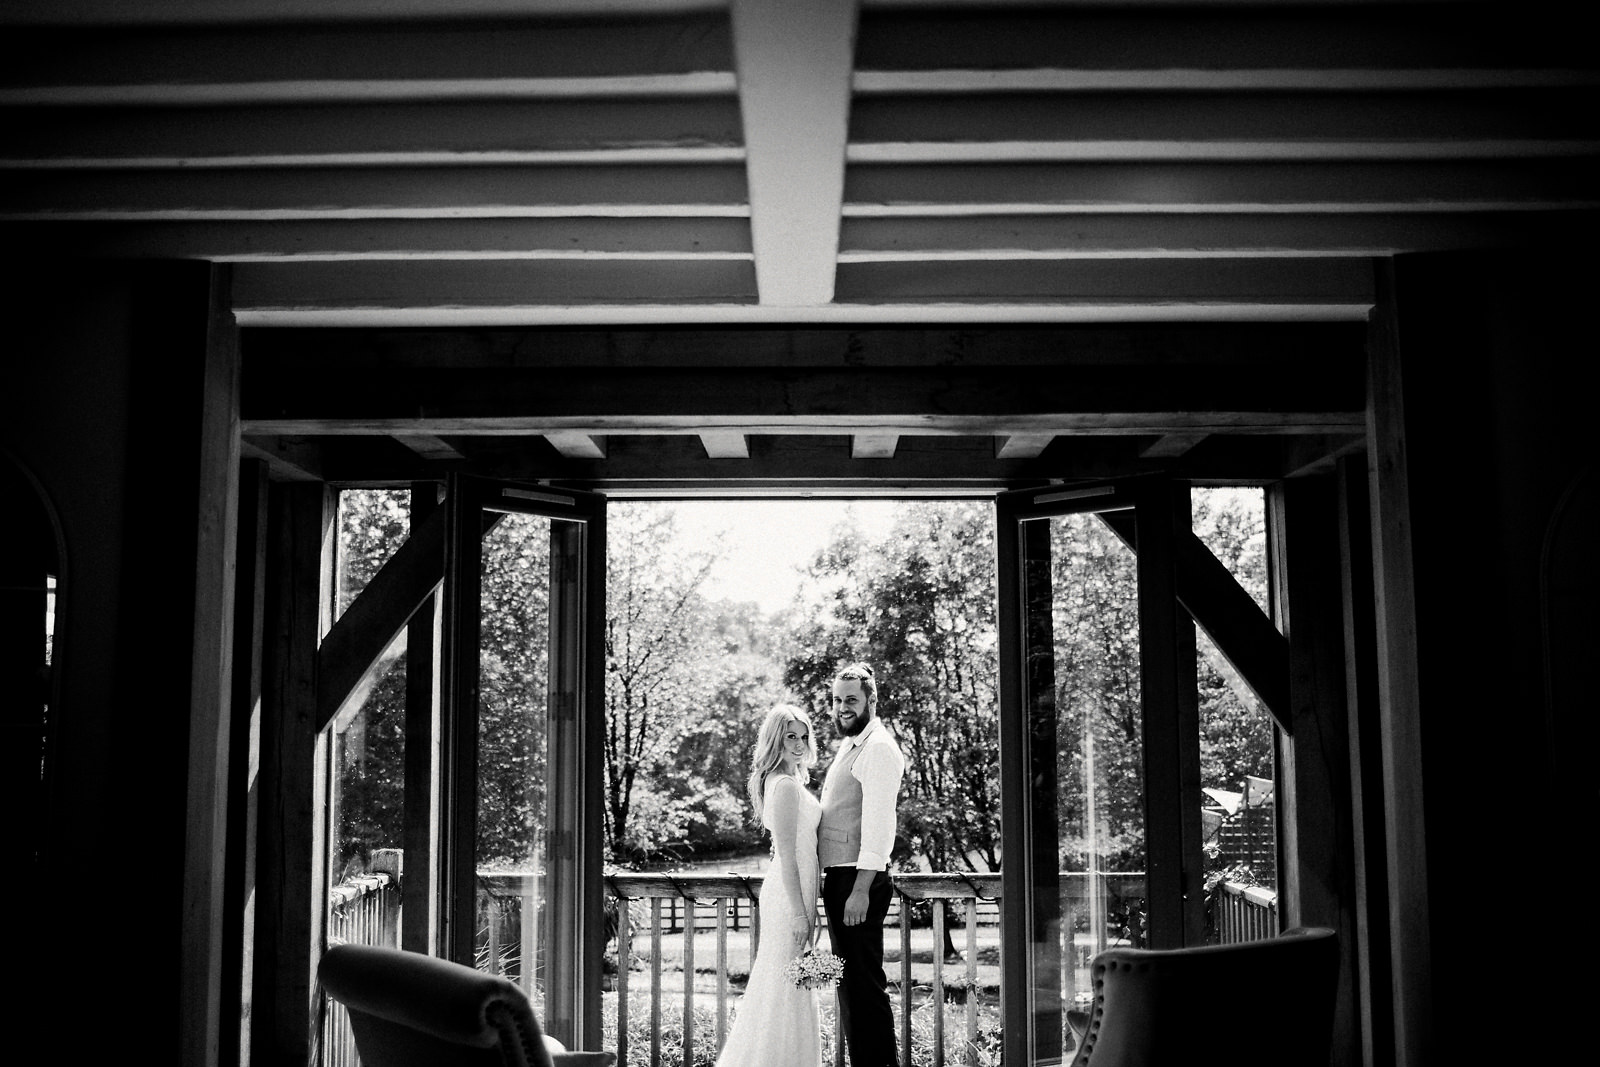 The Copse Creative wedding photography